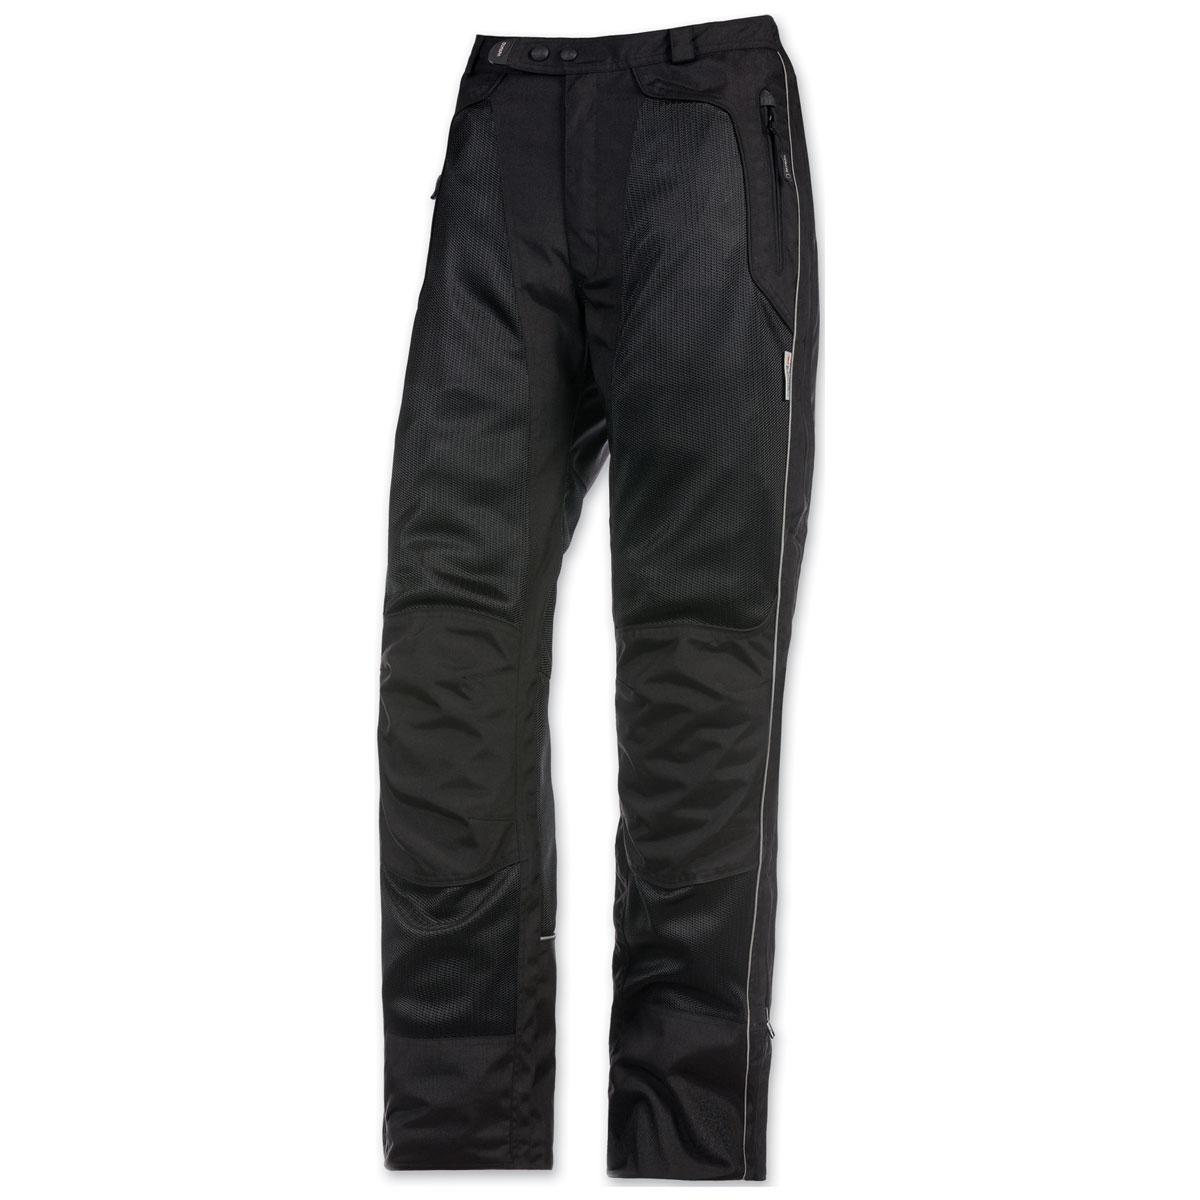 Olympia Moto Sports Men's Airglide 4 Mesh Tech Black Pants